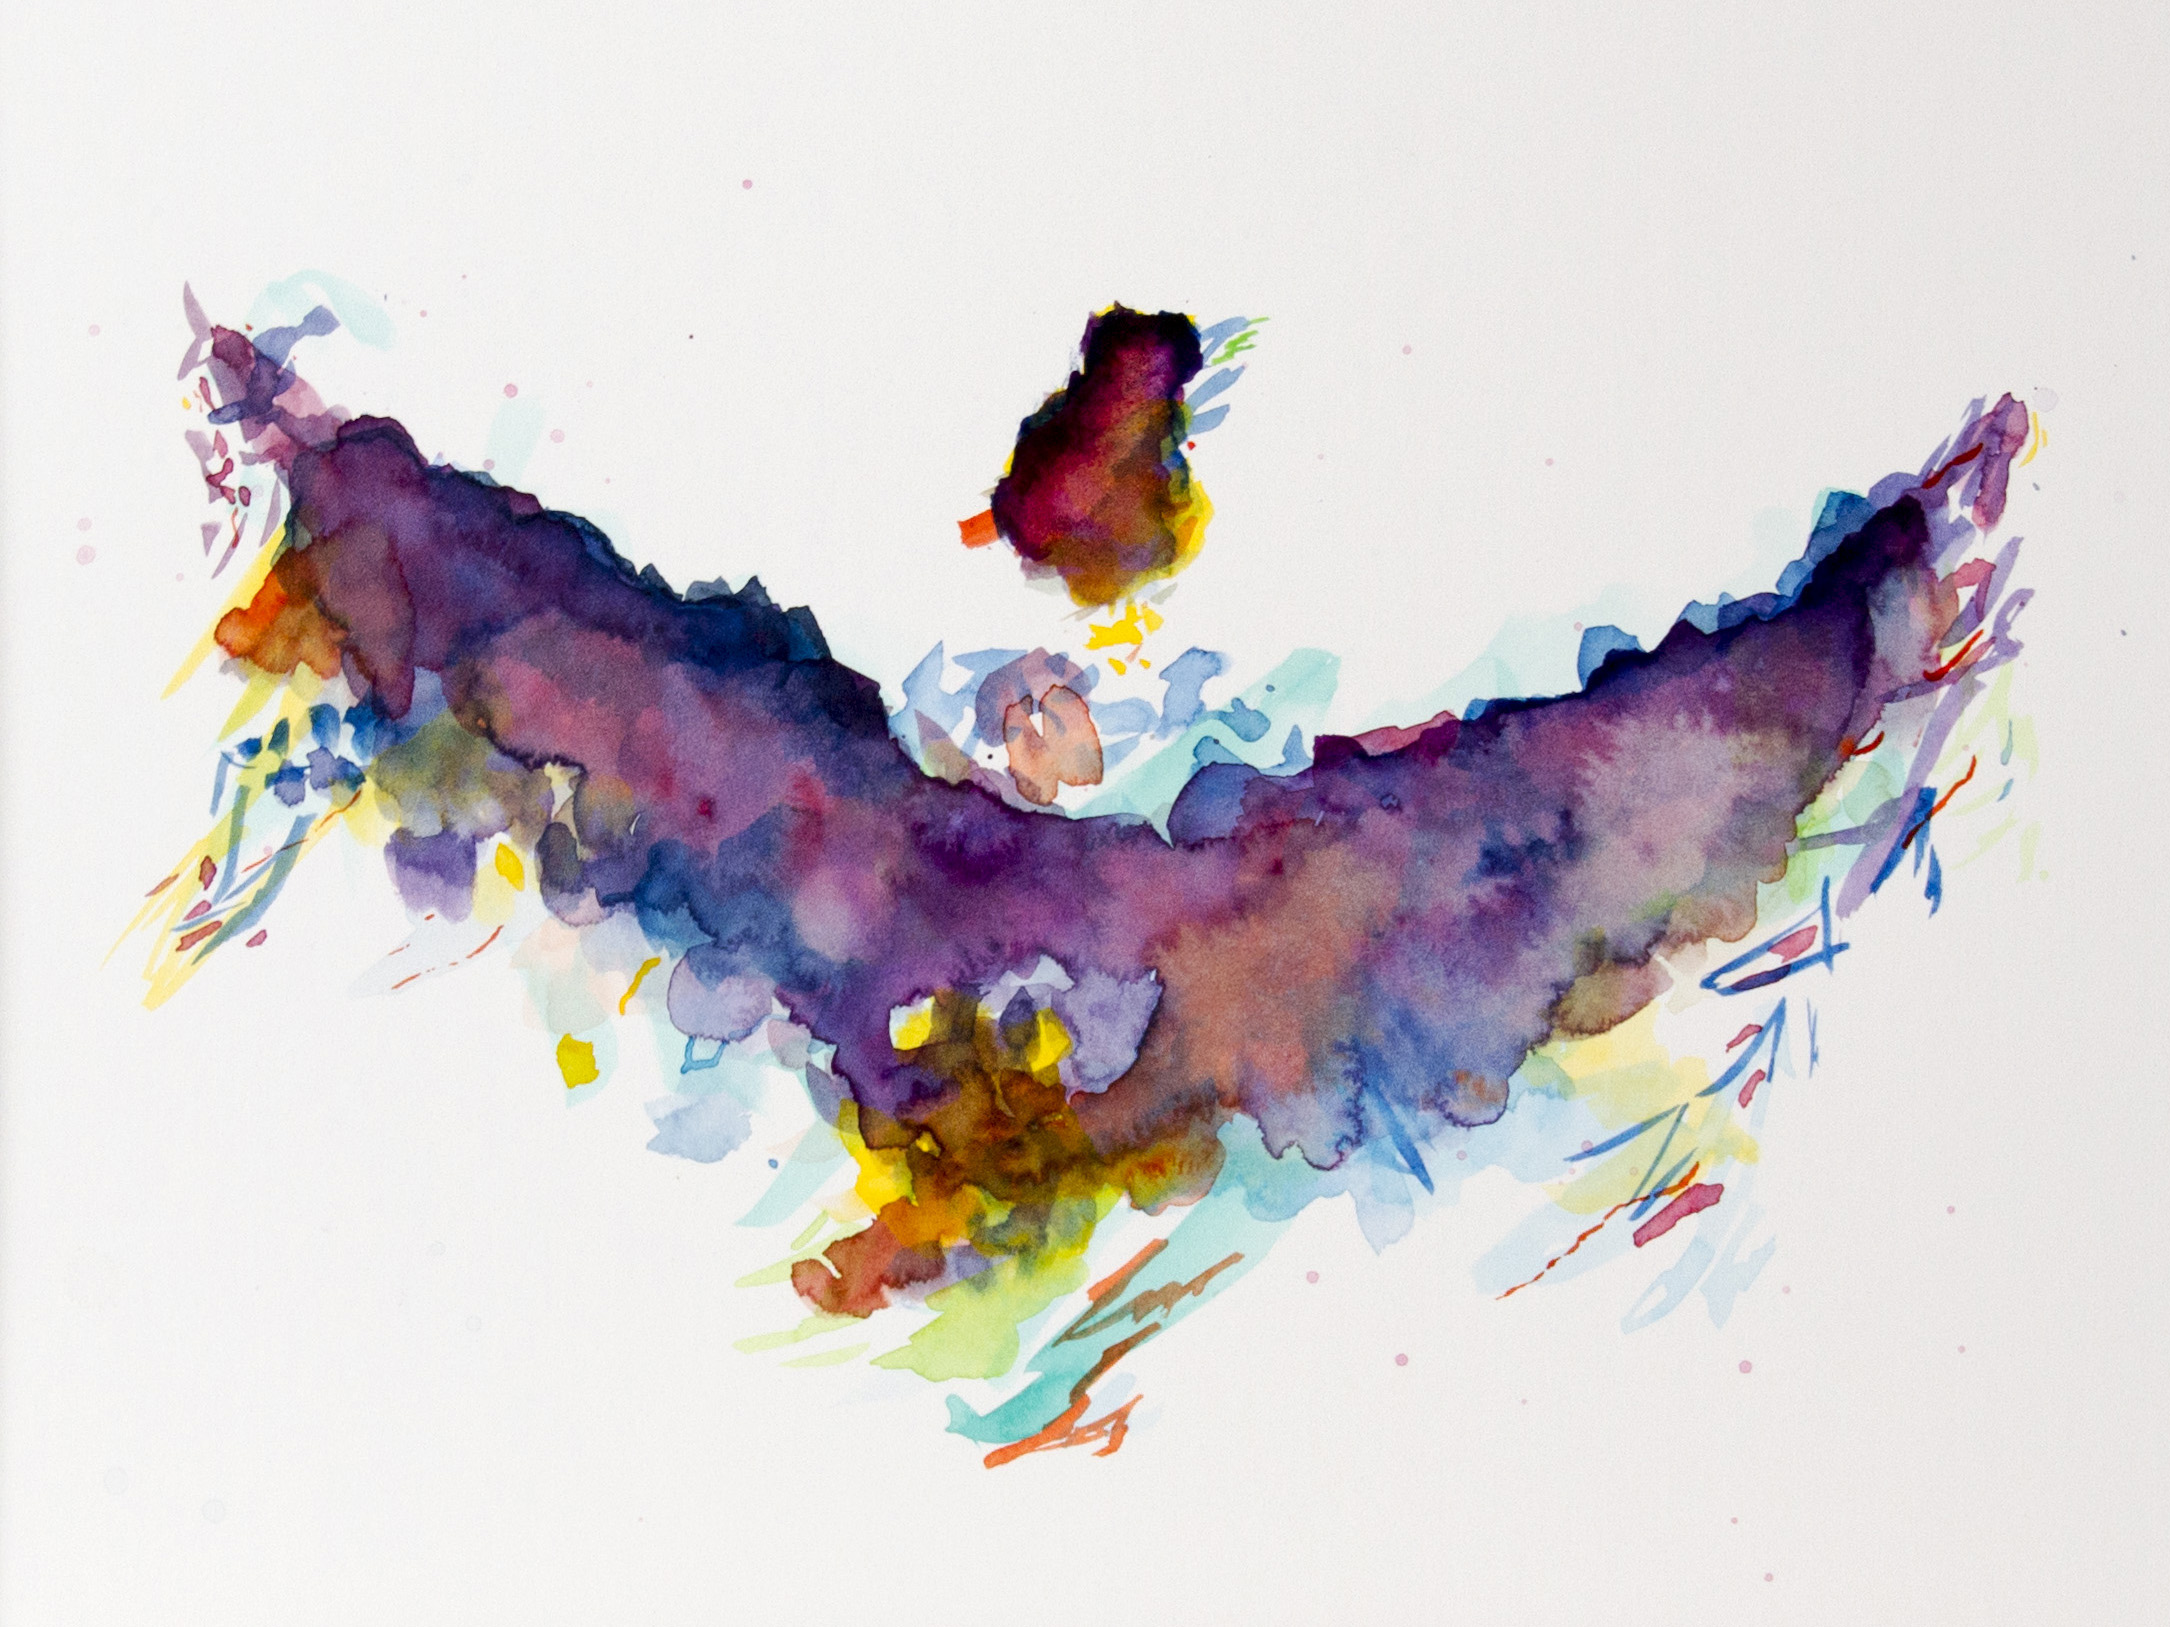 abstractwatercolorbirdframedwebsite.jpg